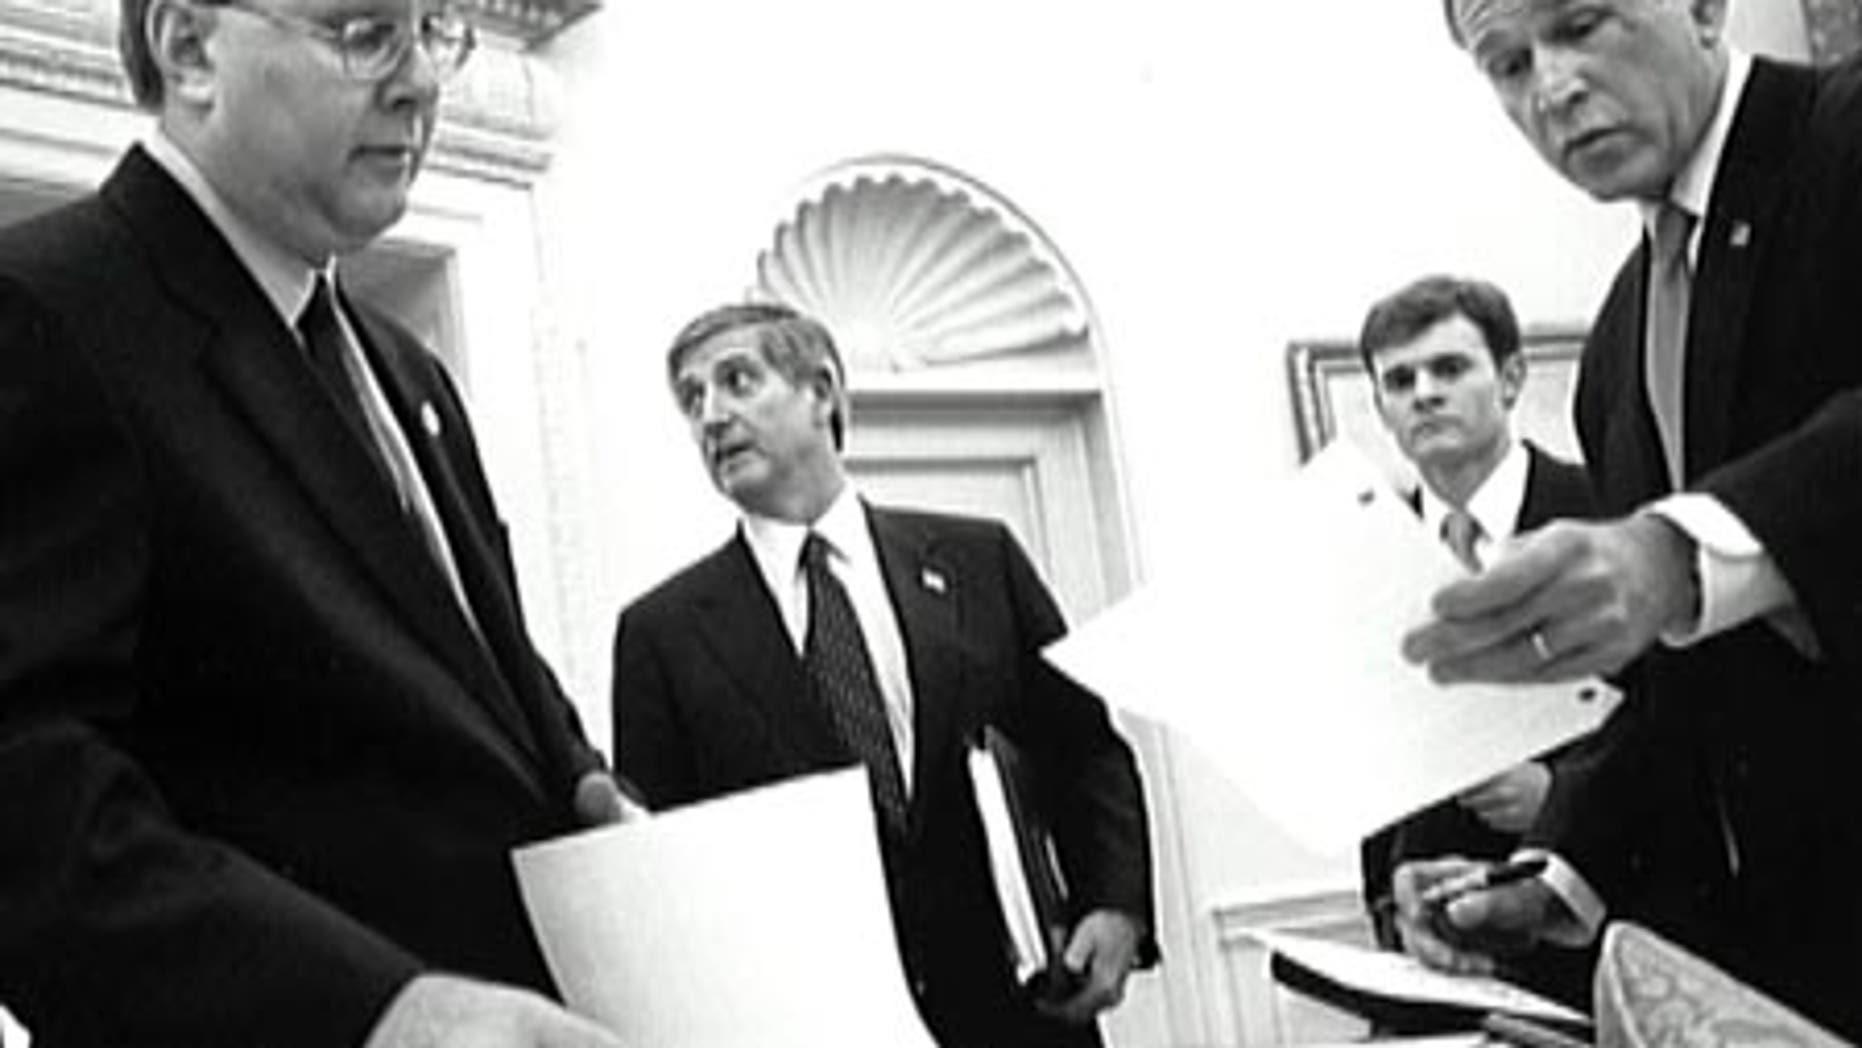 Karl Rove with former President George W. Bush